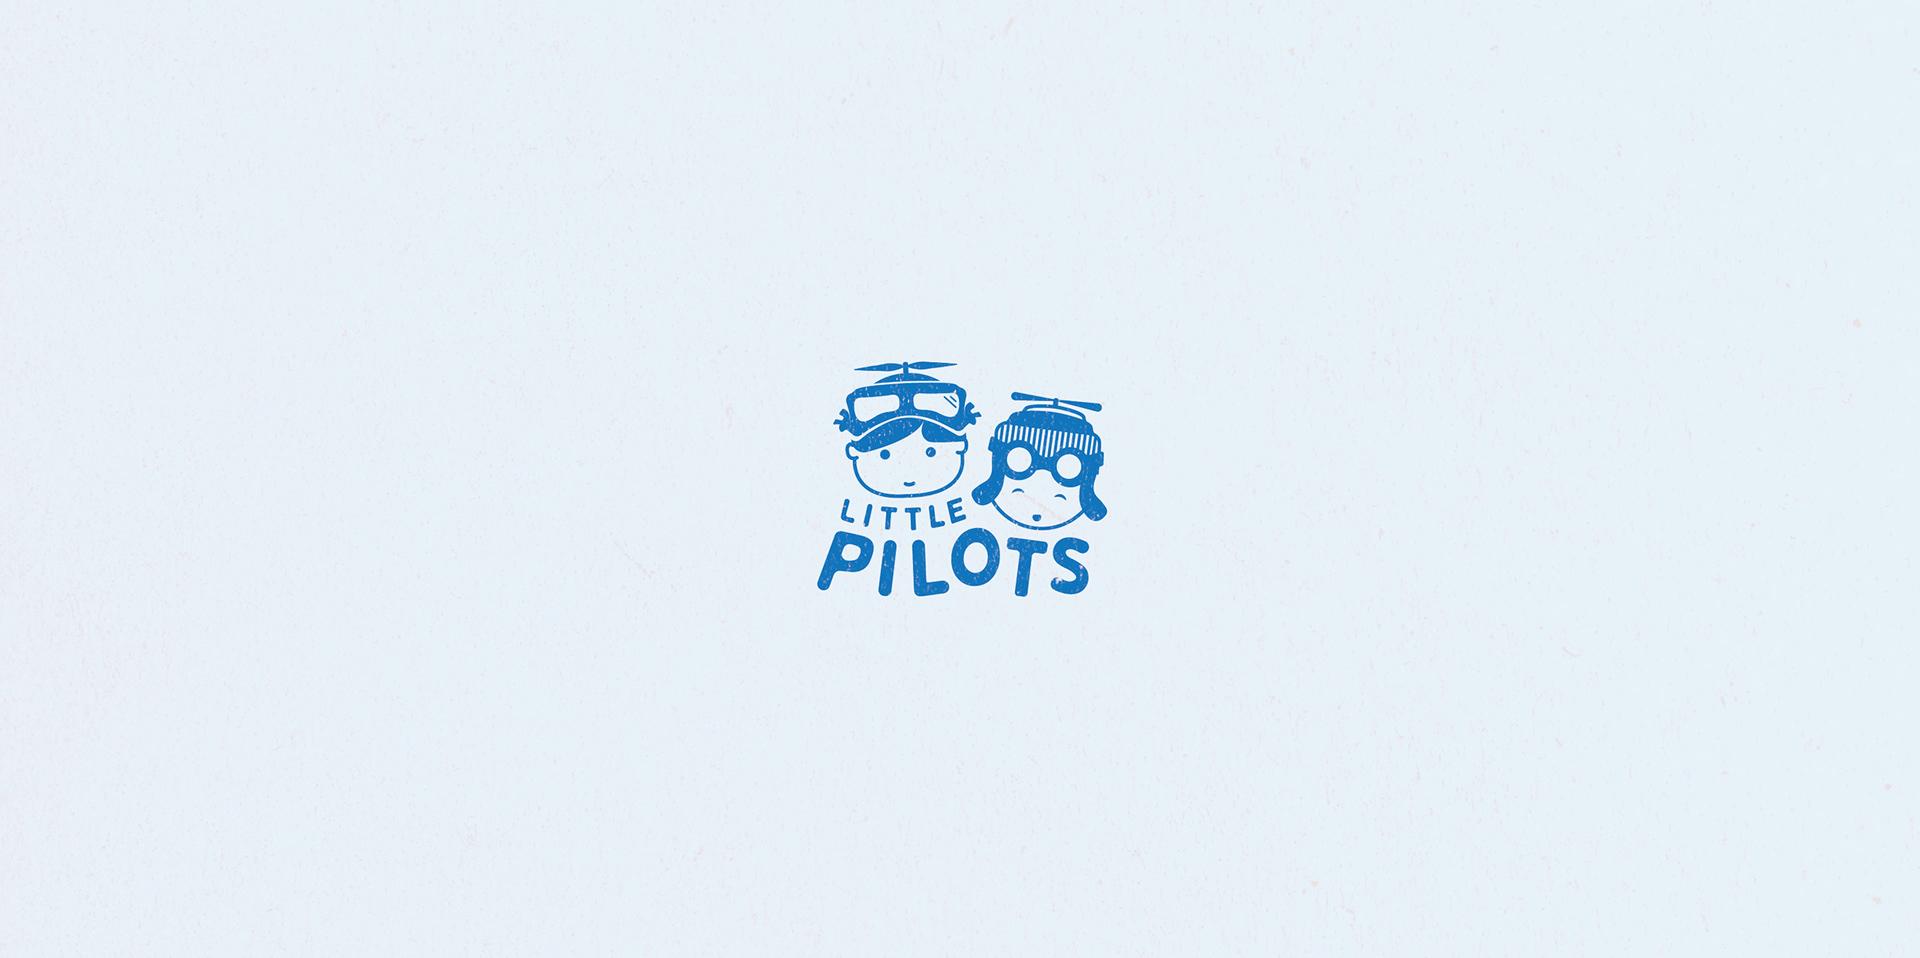 little pilots logo background